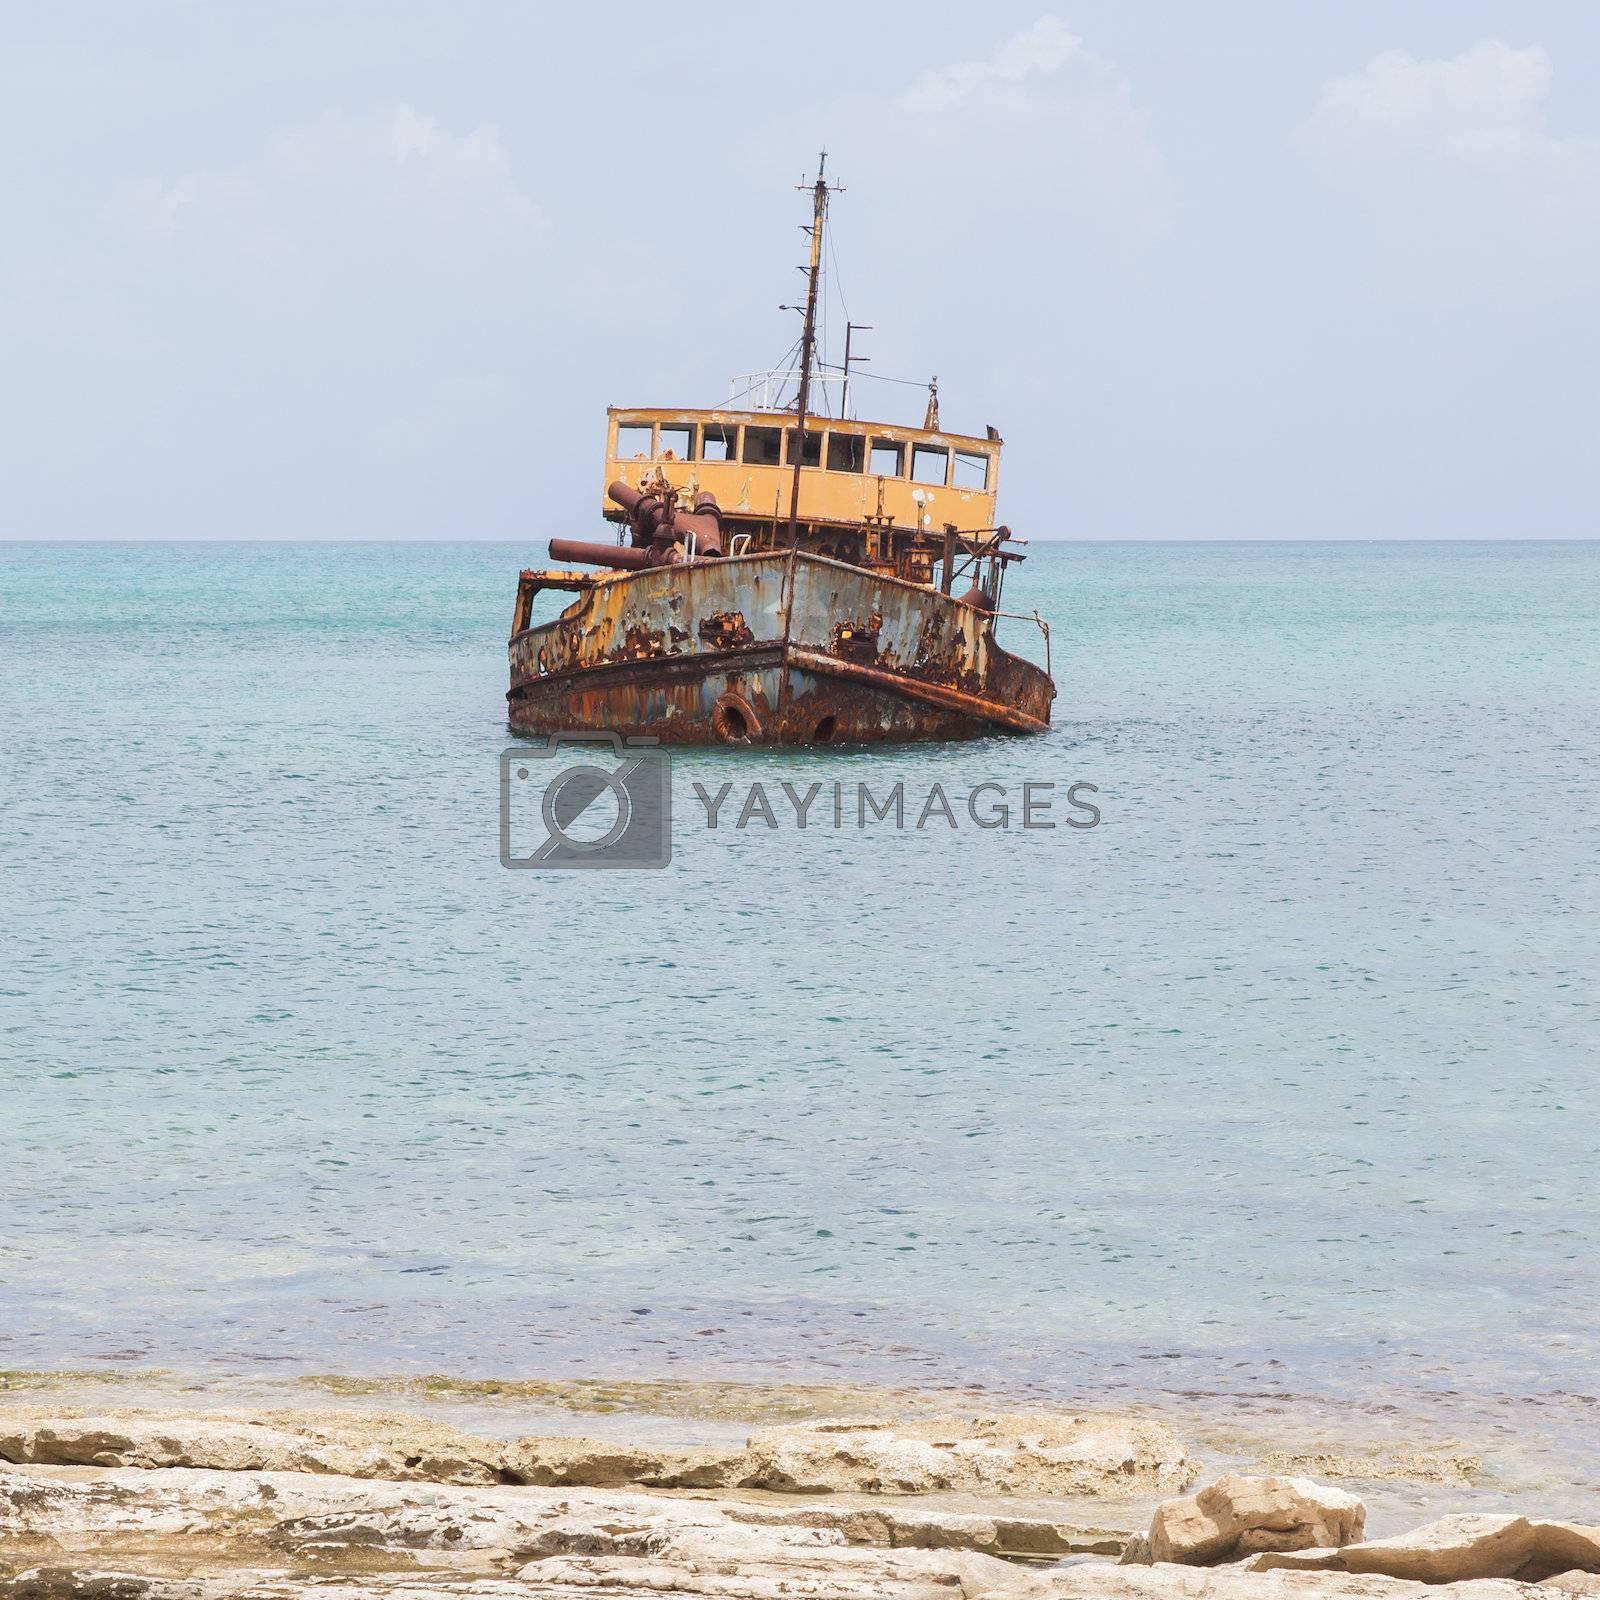 Unidentified sunken vessel at the coast of the Caribbean Isle of Saint Martin